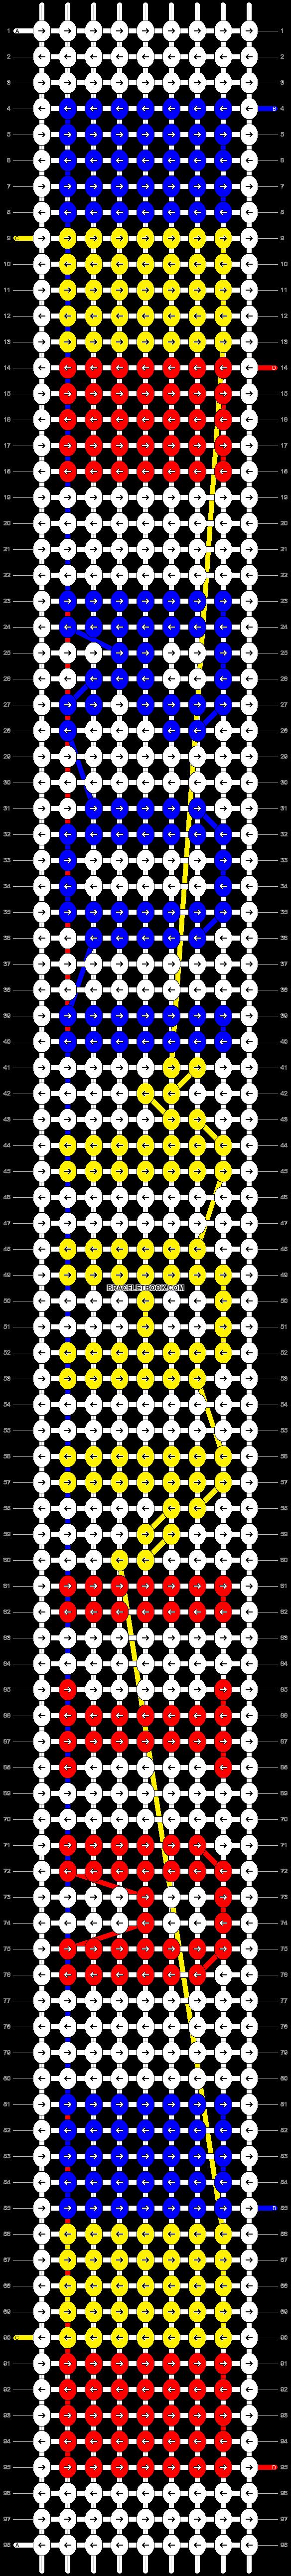 Alpha pattern #31152 variation #20084 pattern